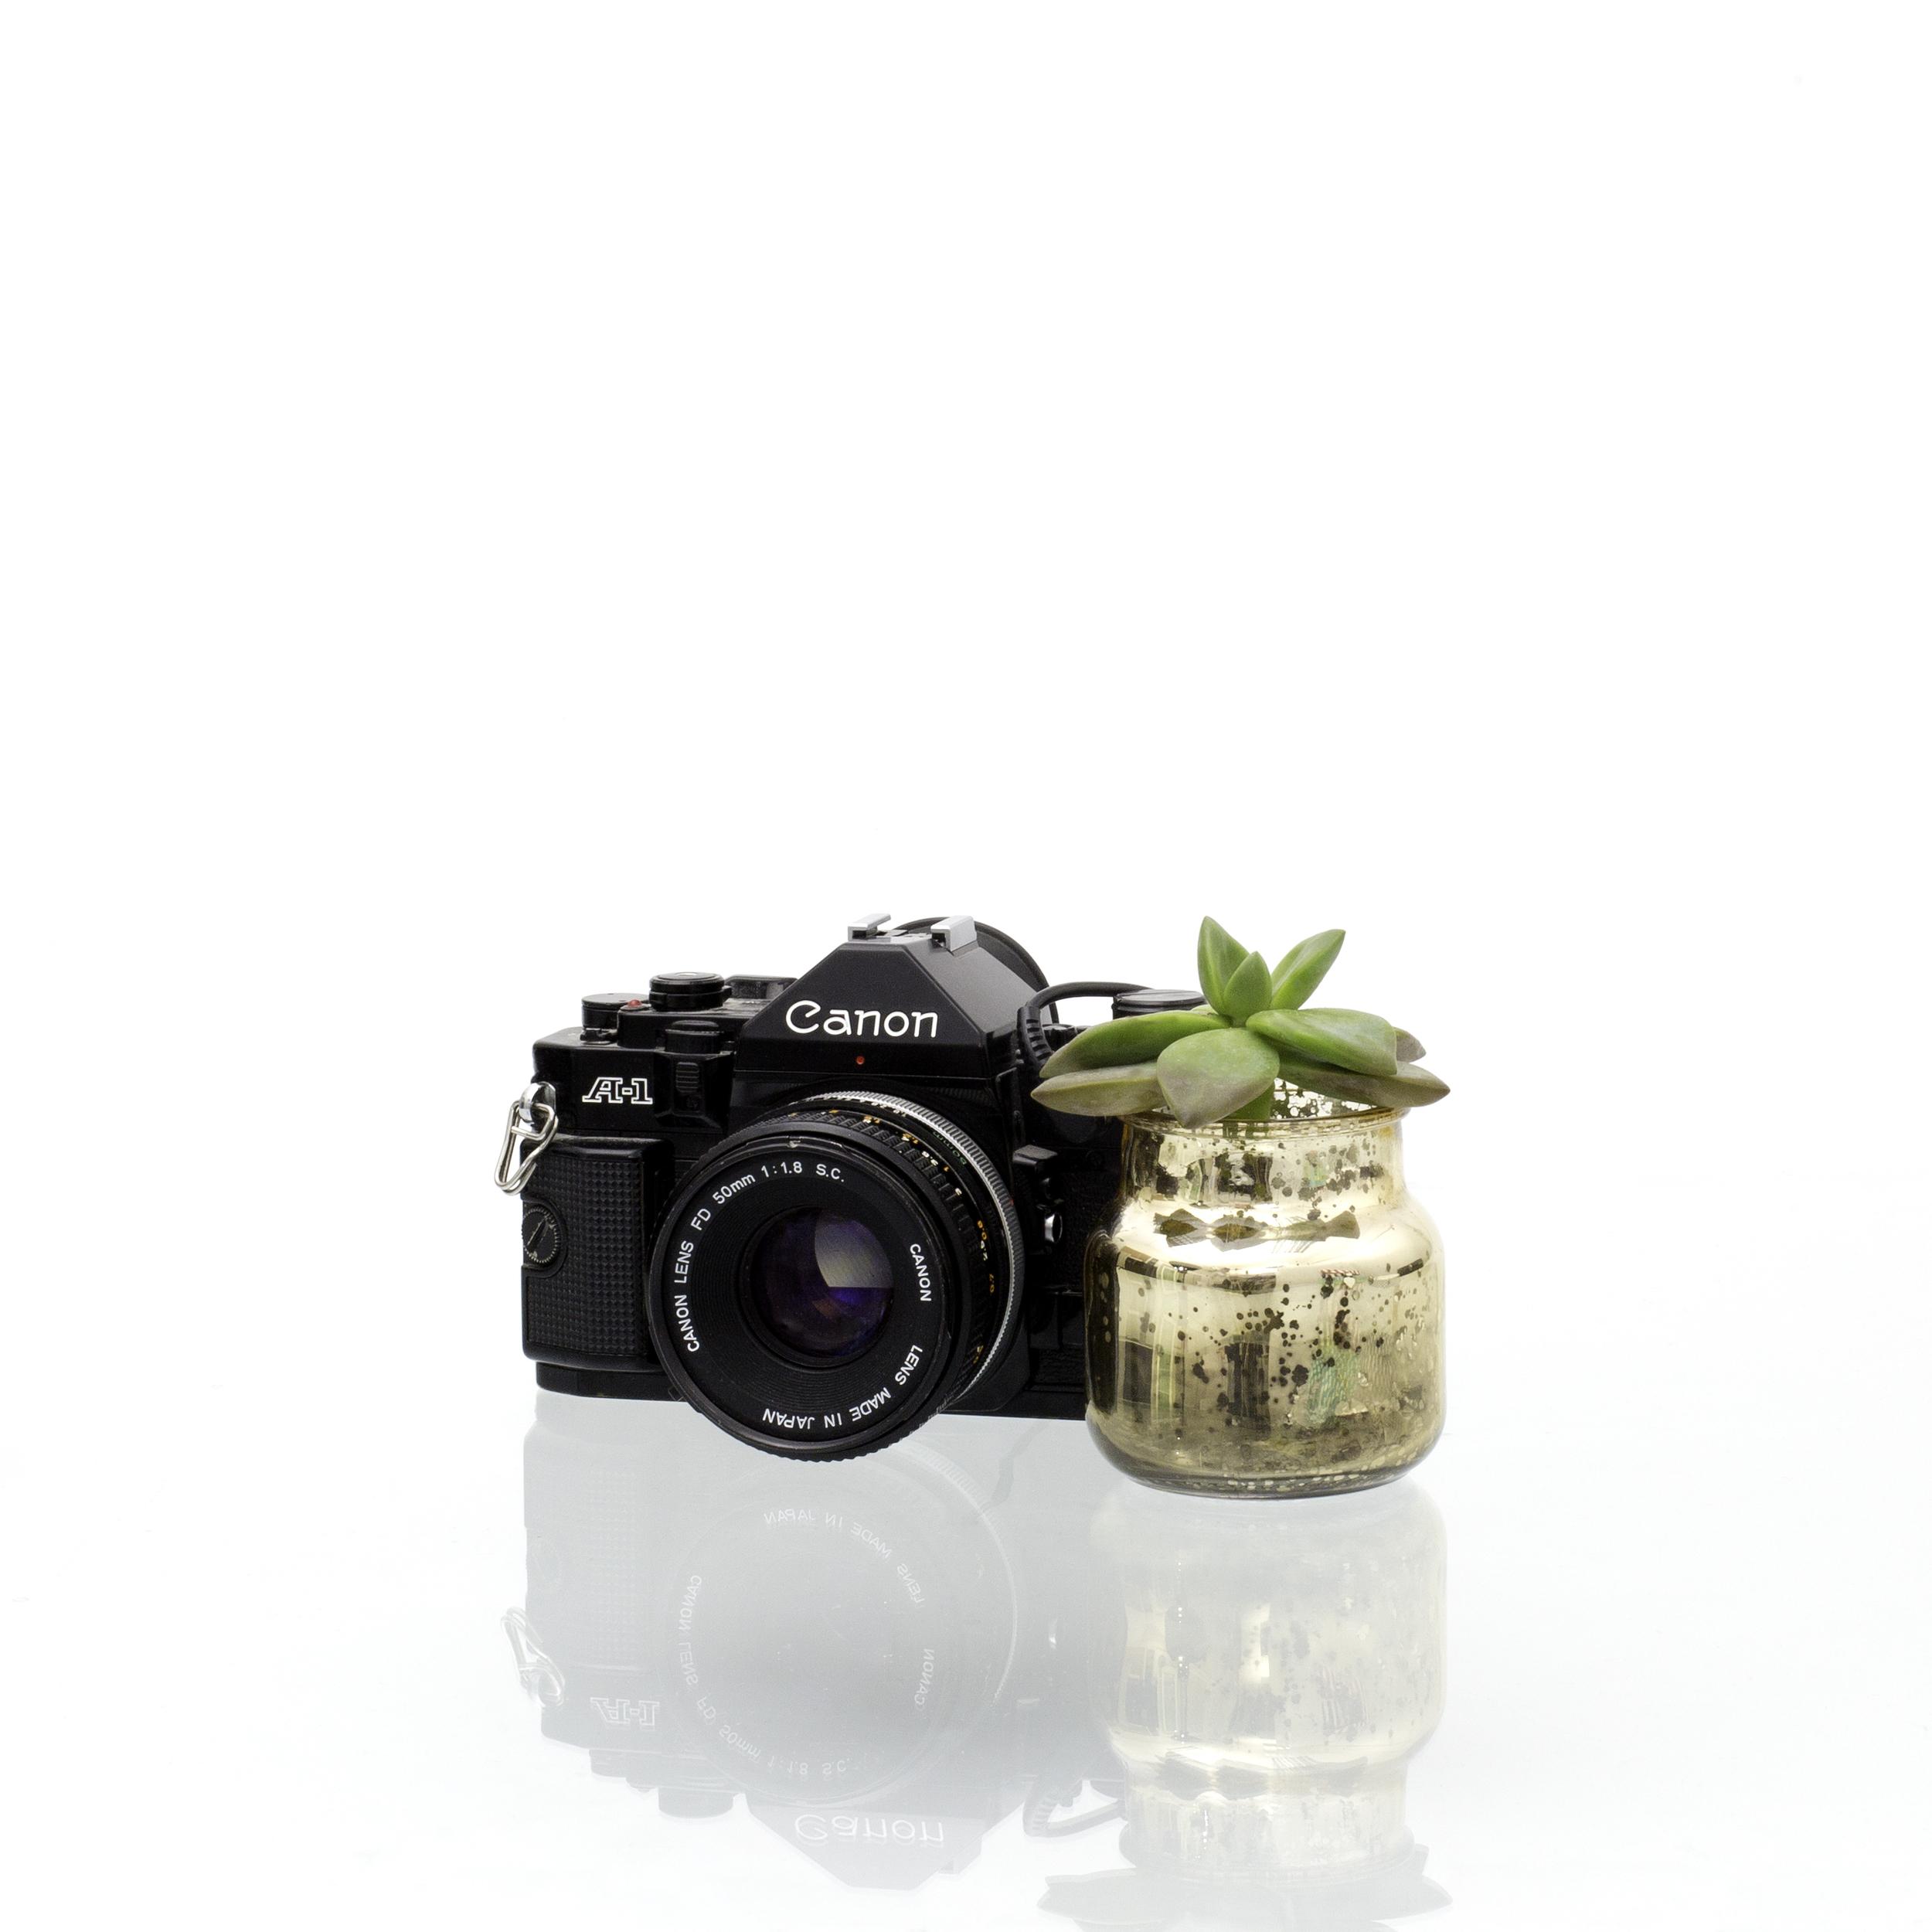 rachel johanna photography / photo reflection / how to / blog